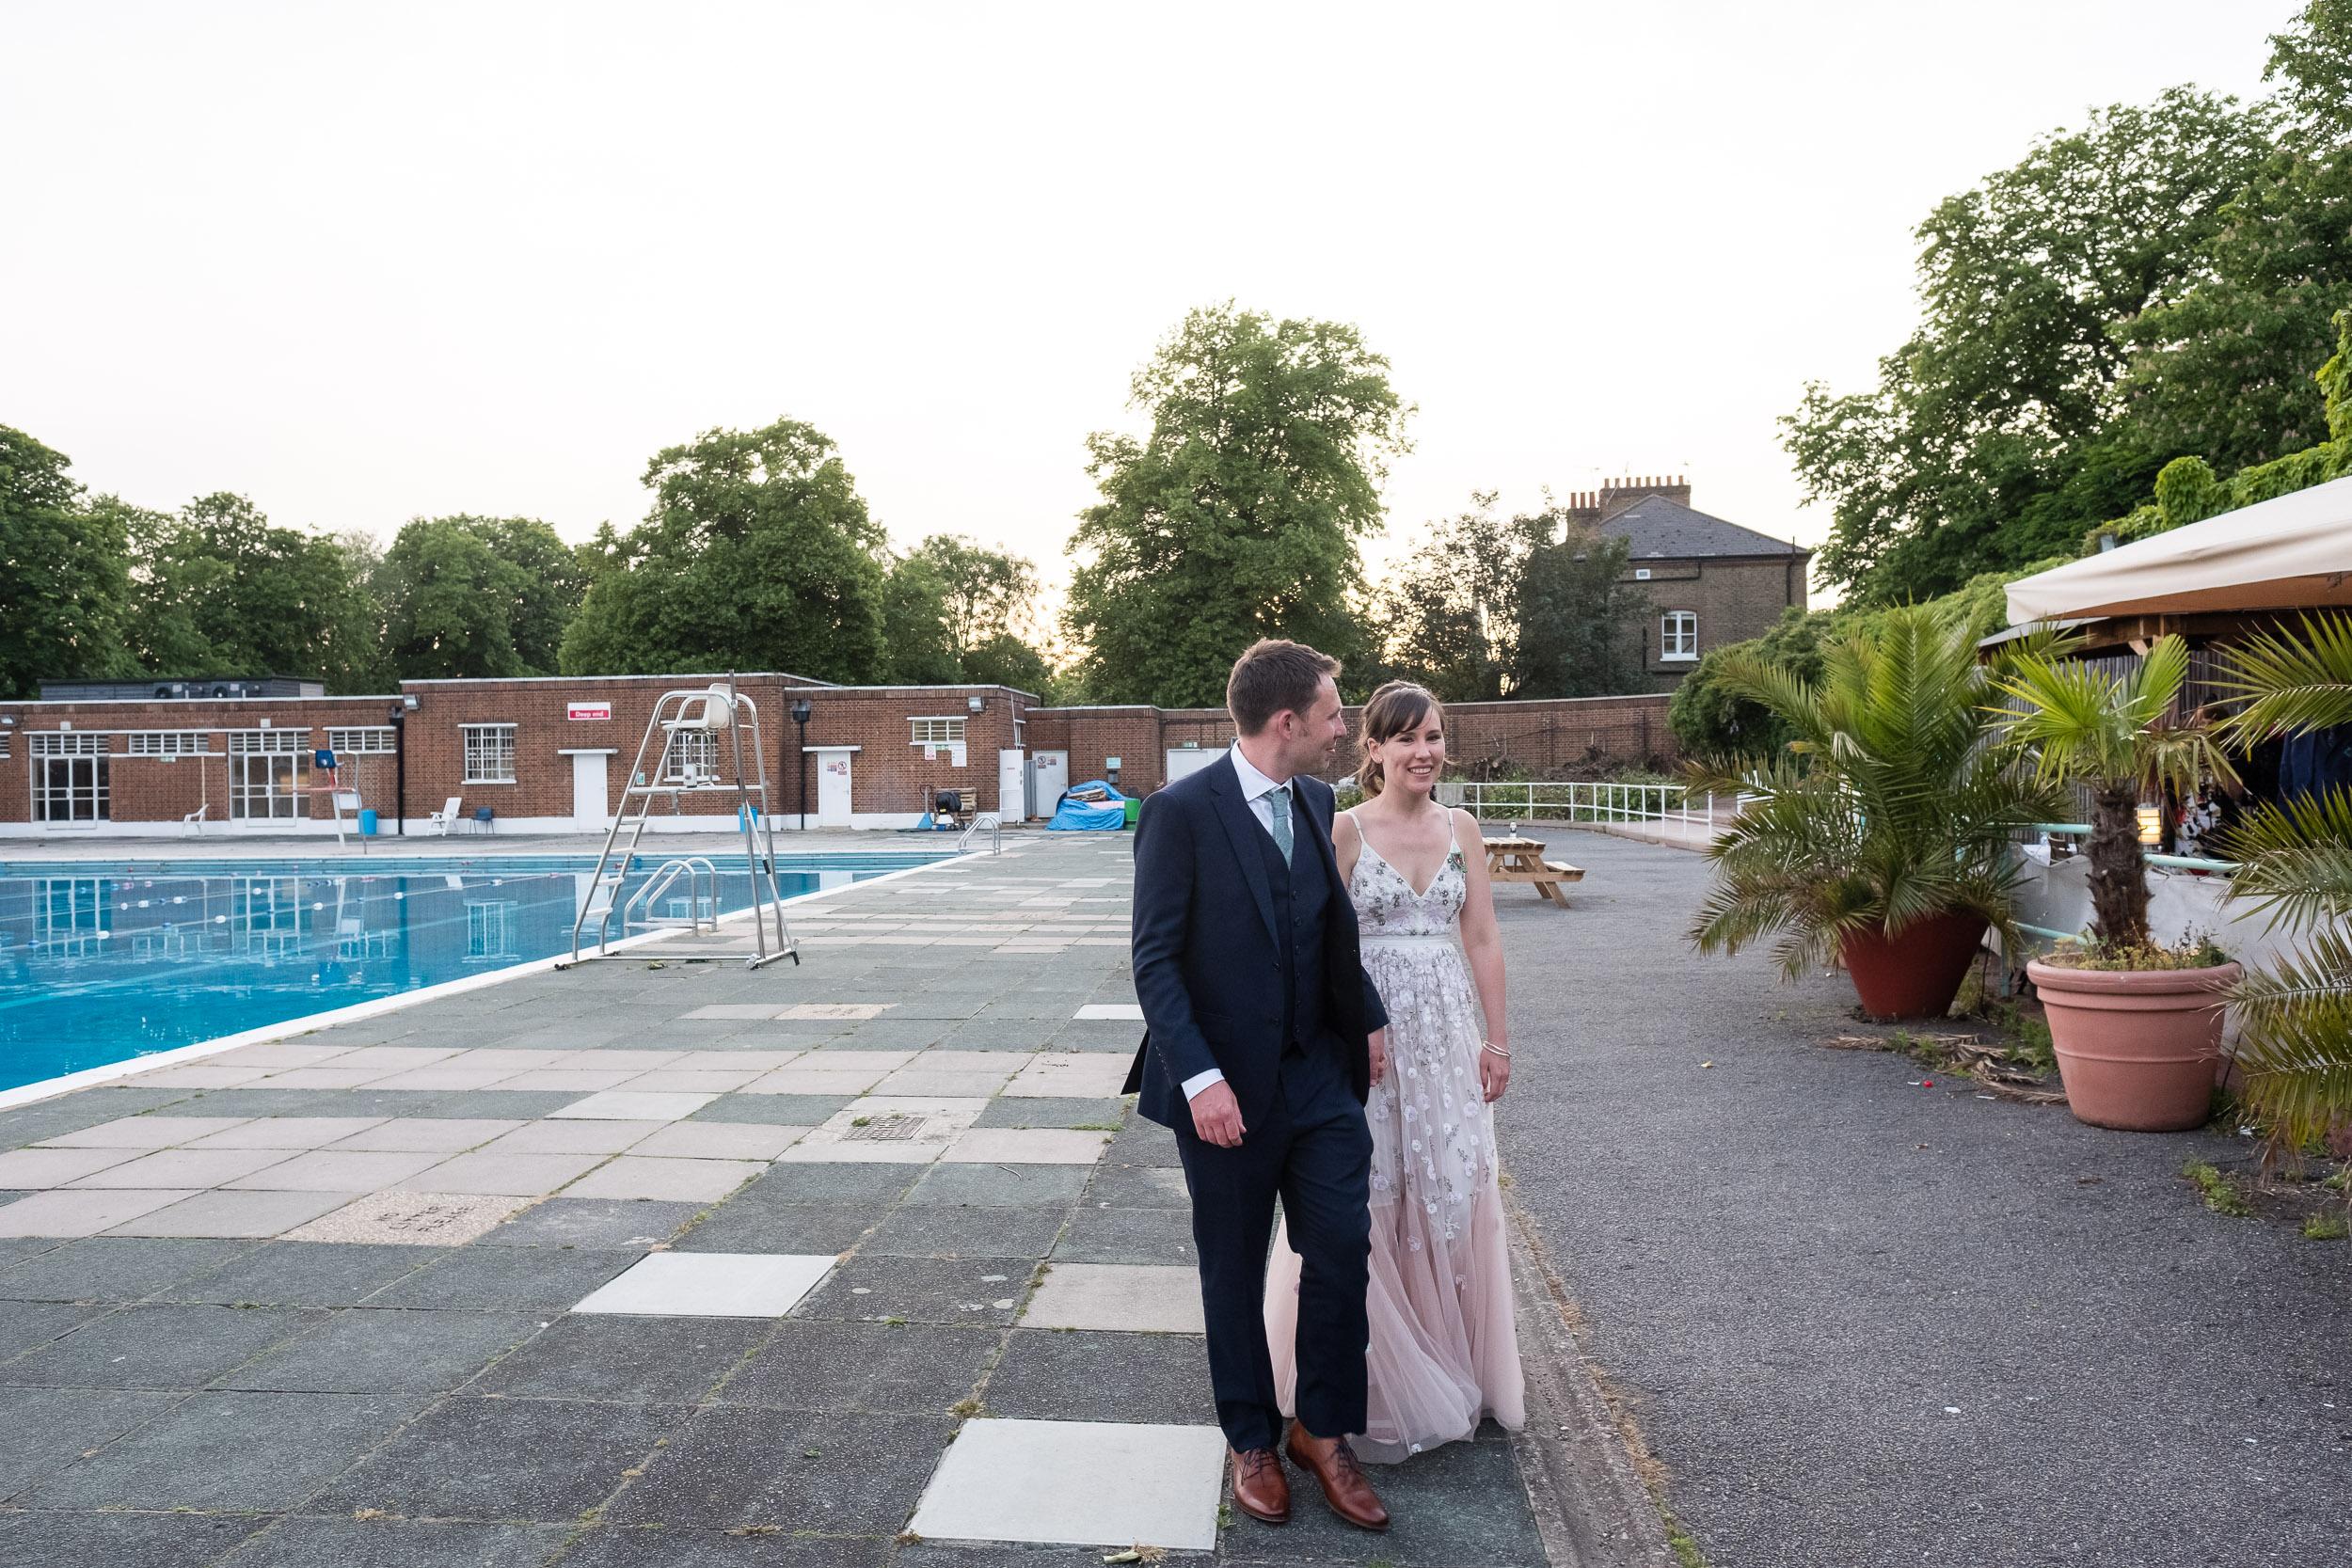 brockwell-lido-brixton-herne-hill-wedding-404.jpg